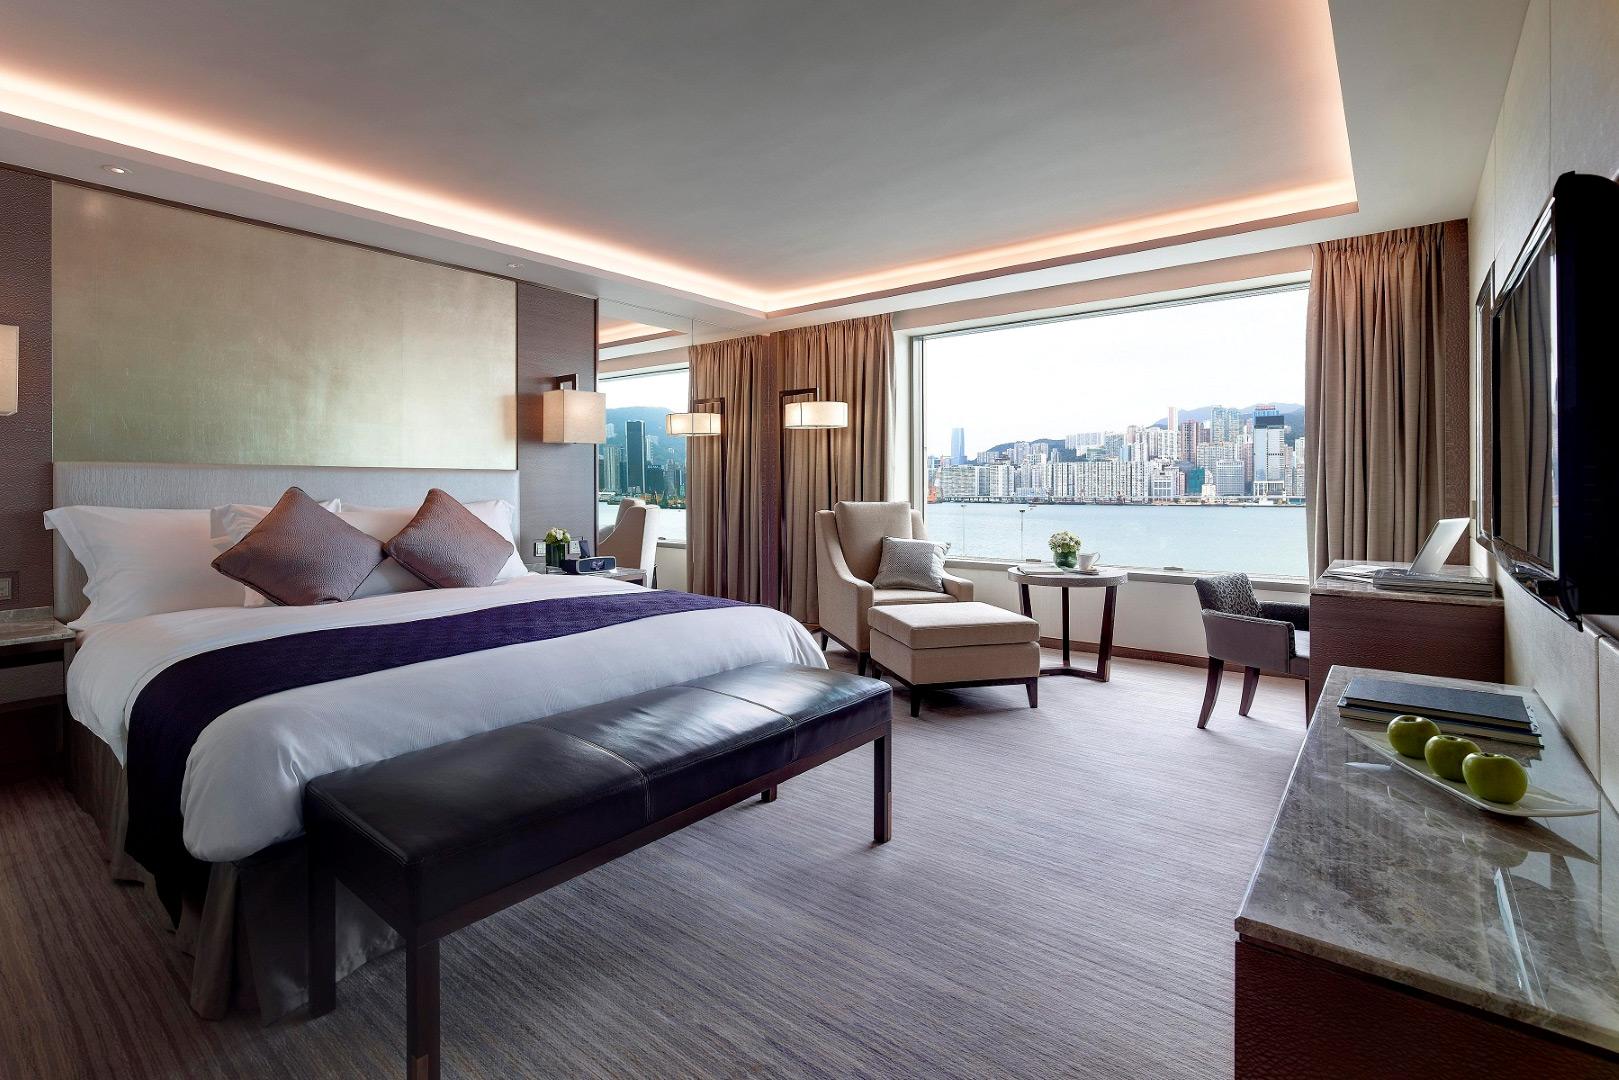 Intercontinental Grand Stanford hotel 5* - Kowloon